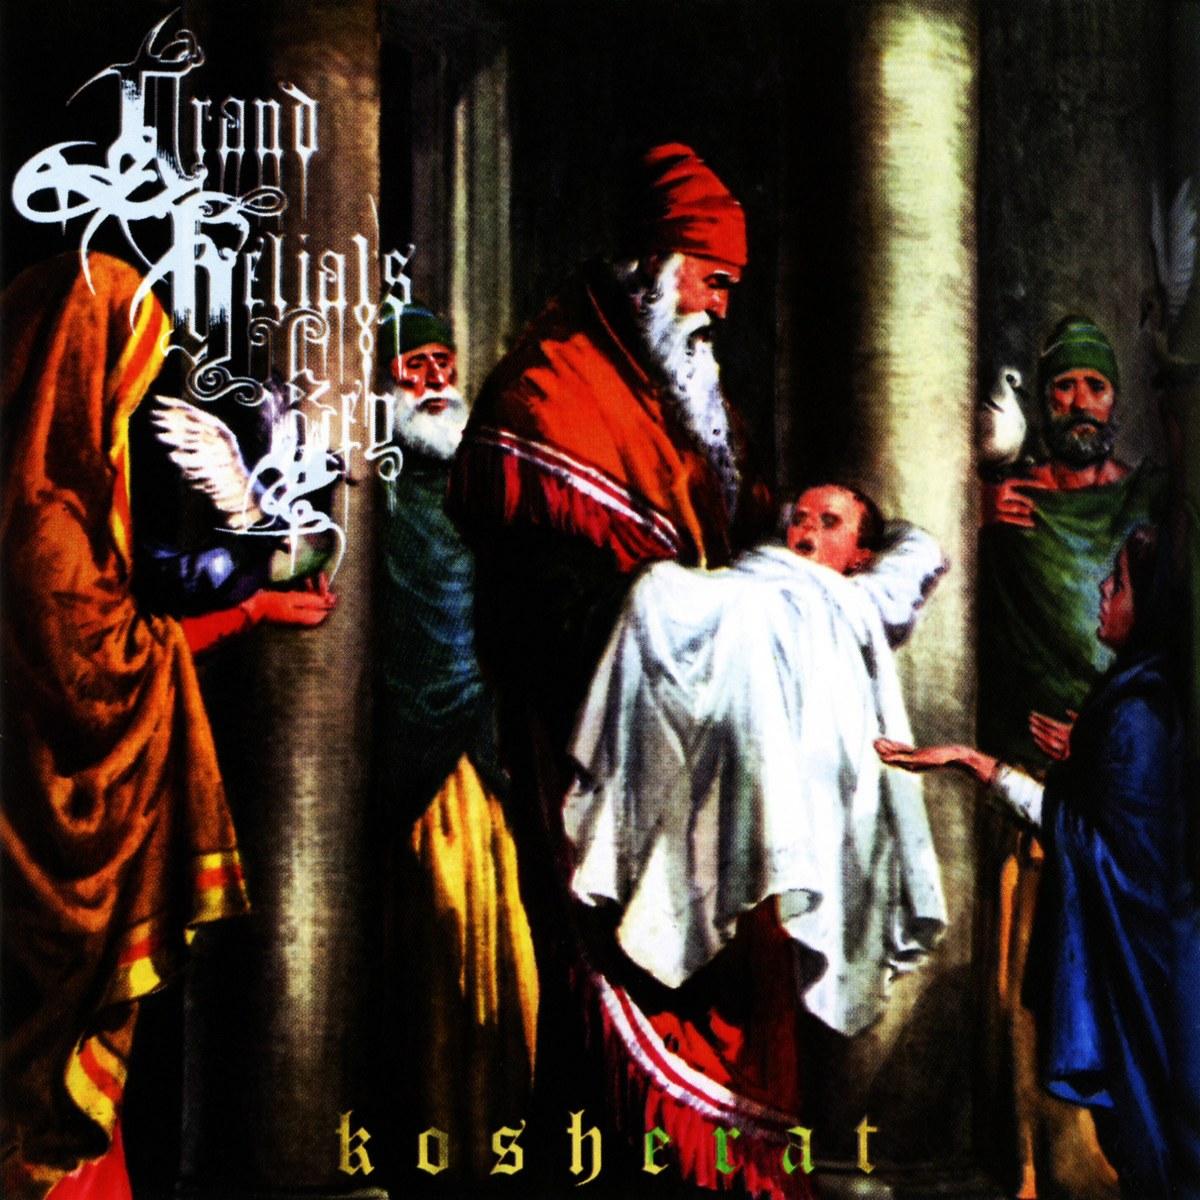 Review for Grand Belial's Key - Kosherat